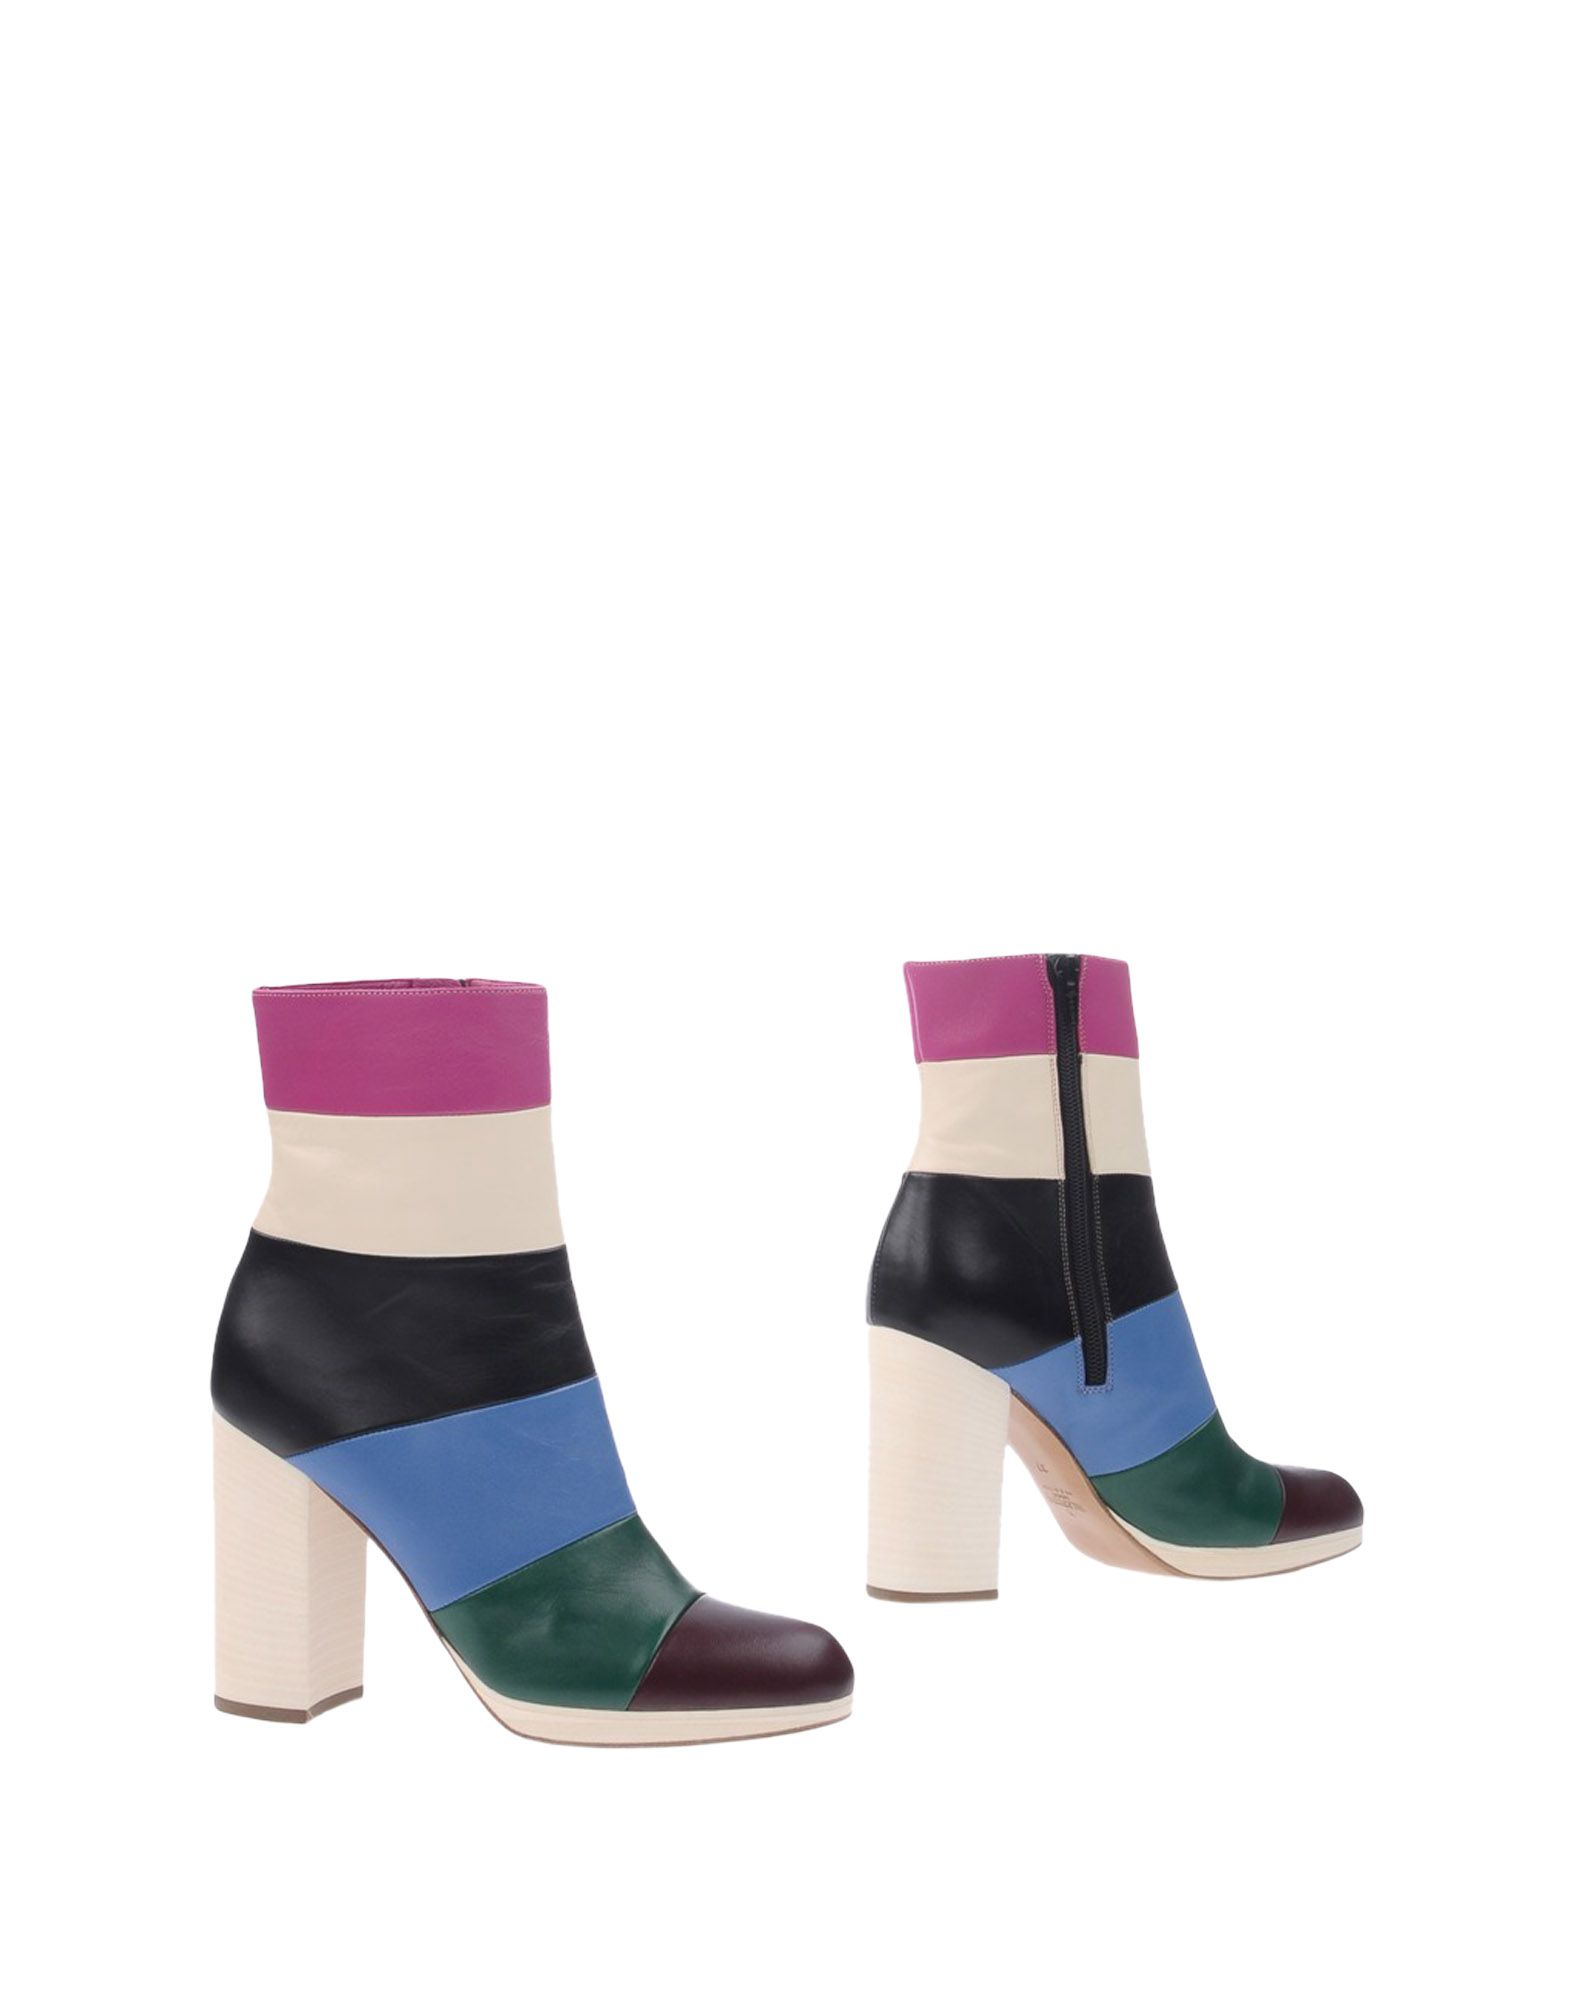 Valentino Garavani Ankle Boot - Women Valentino Garavani Ankle Boots Boots Boots online on  United Kingdom - 11308627CA 326f8e